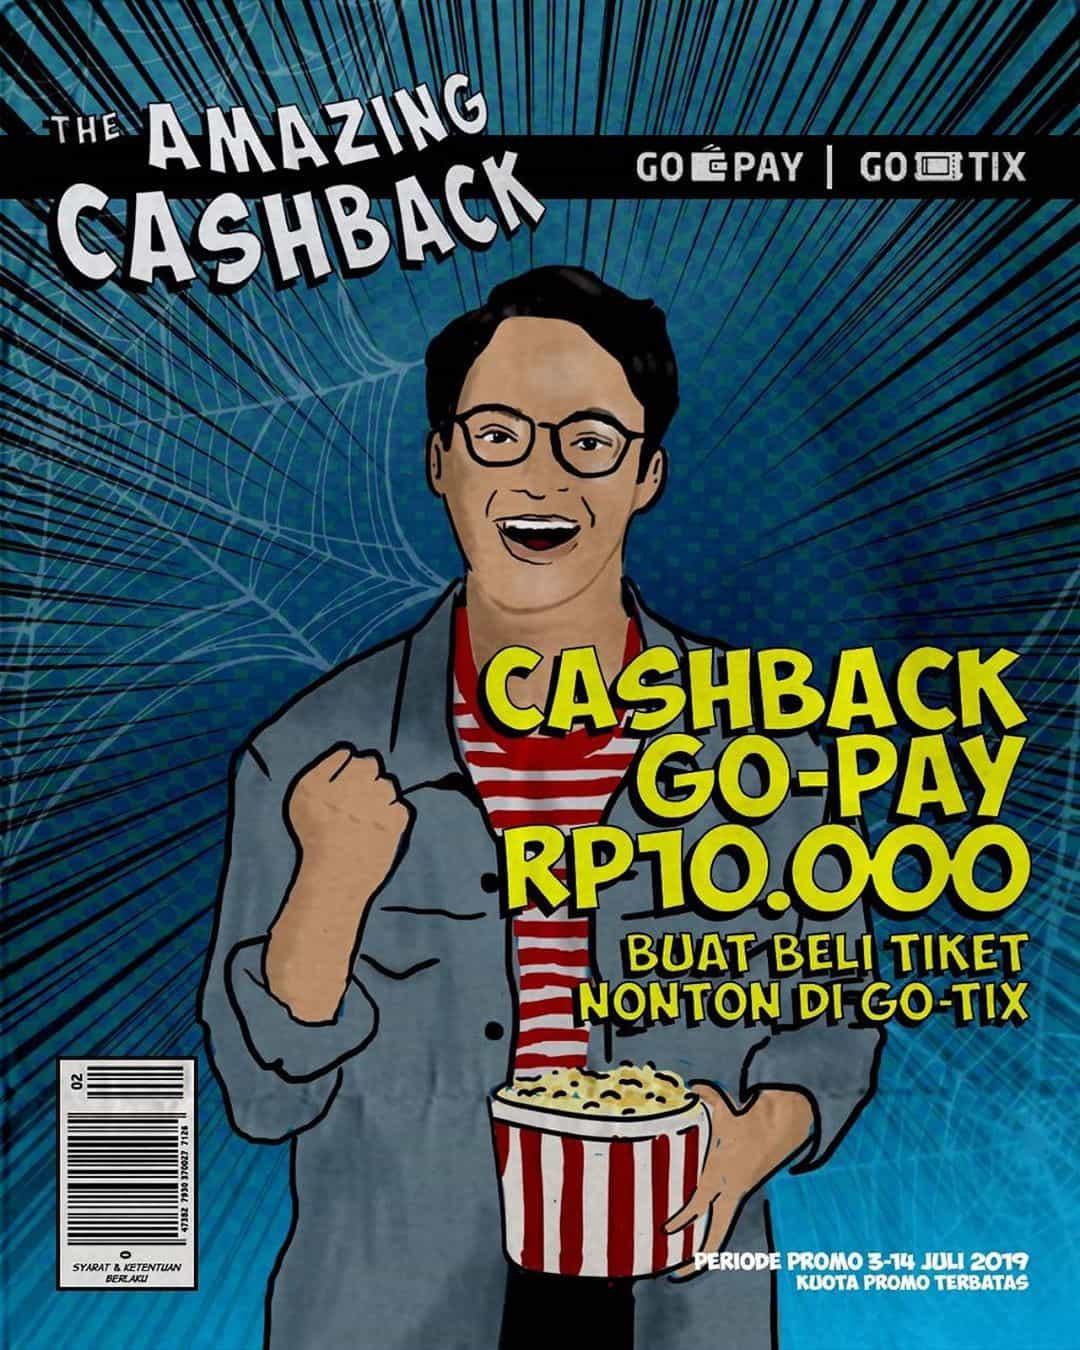 GO-TIX The Amazing Cashback Dapatkan Cashback Rp.10.000 untuk pemesanan Tiket Nonton